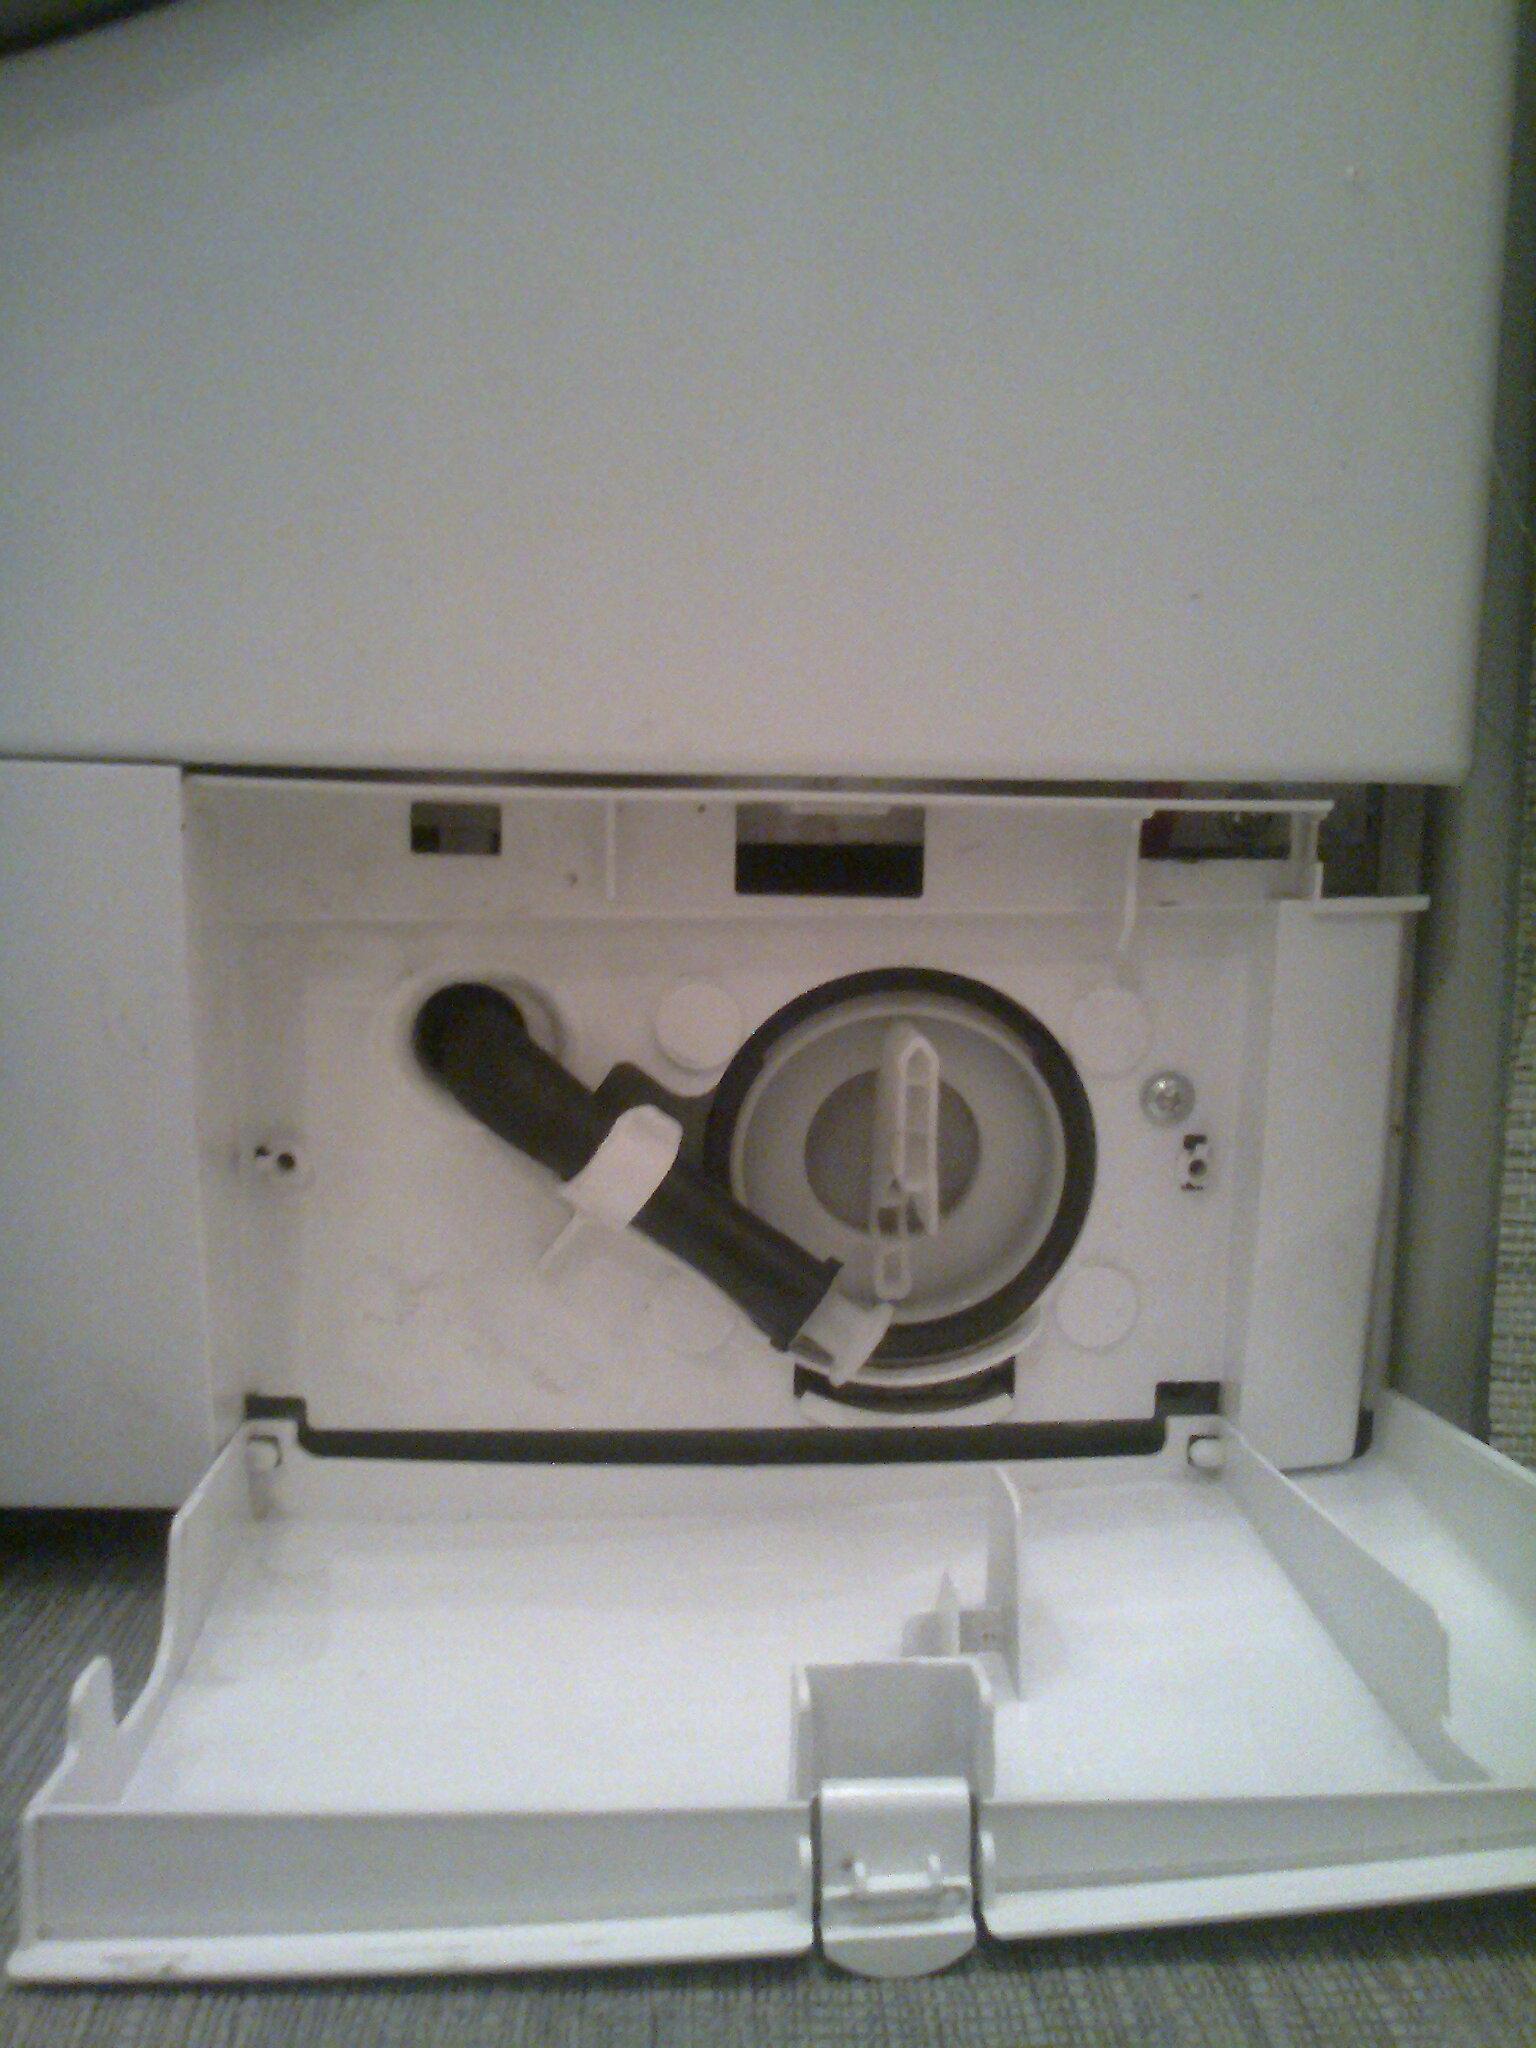 Entretien Machine A Laver entretien machine a laver - l'art du tuyau